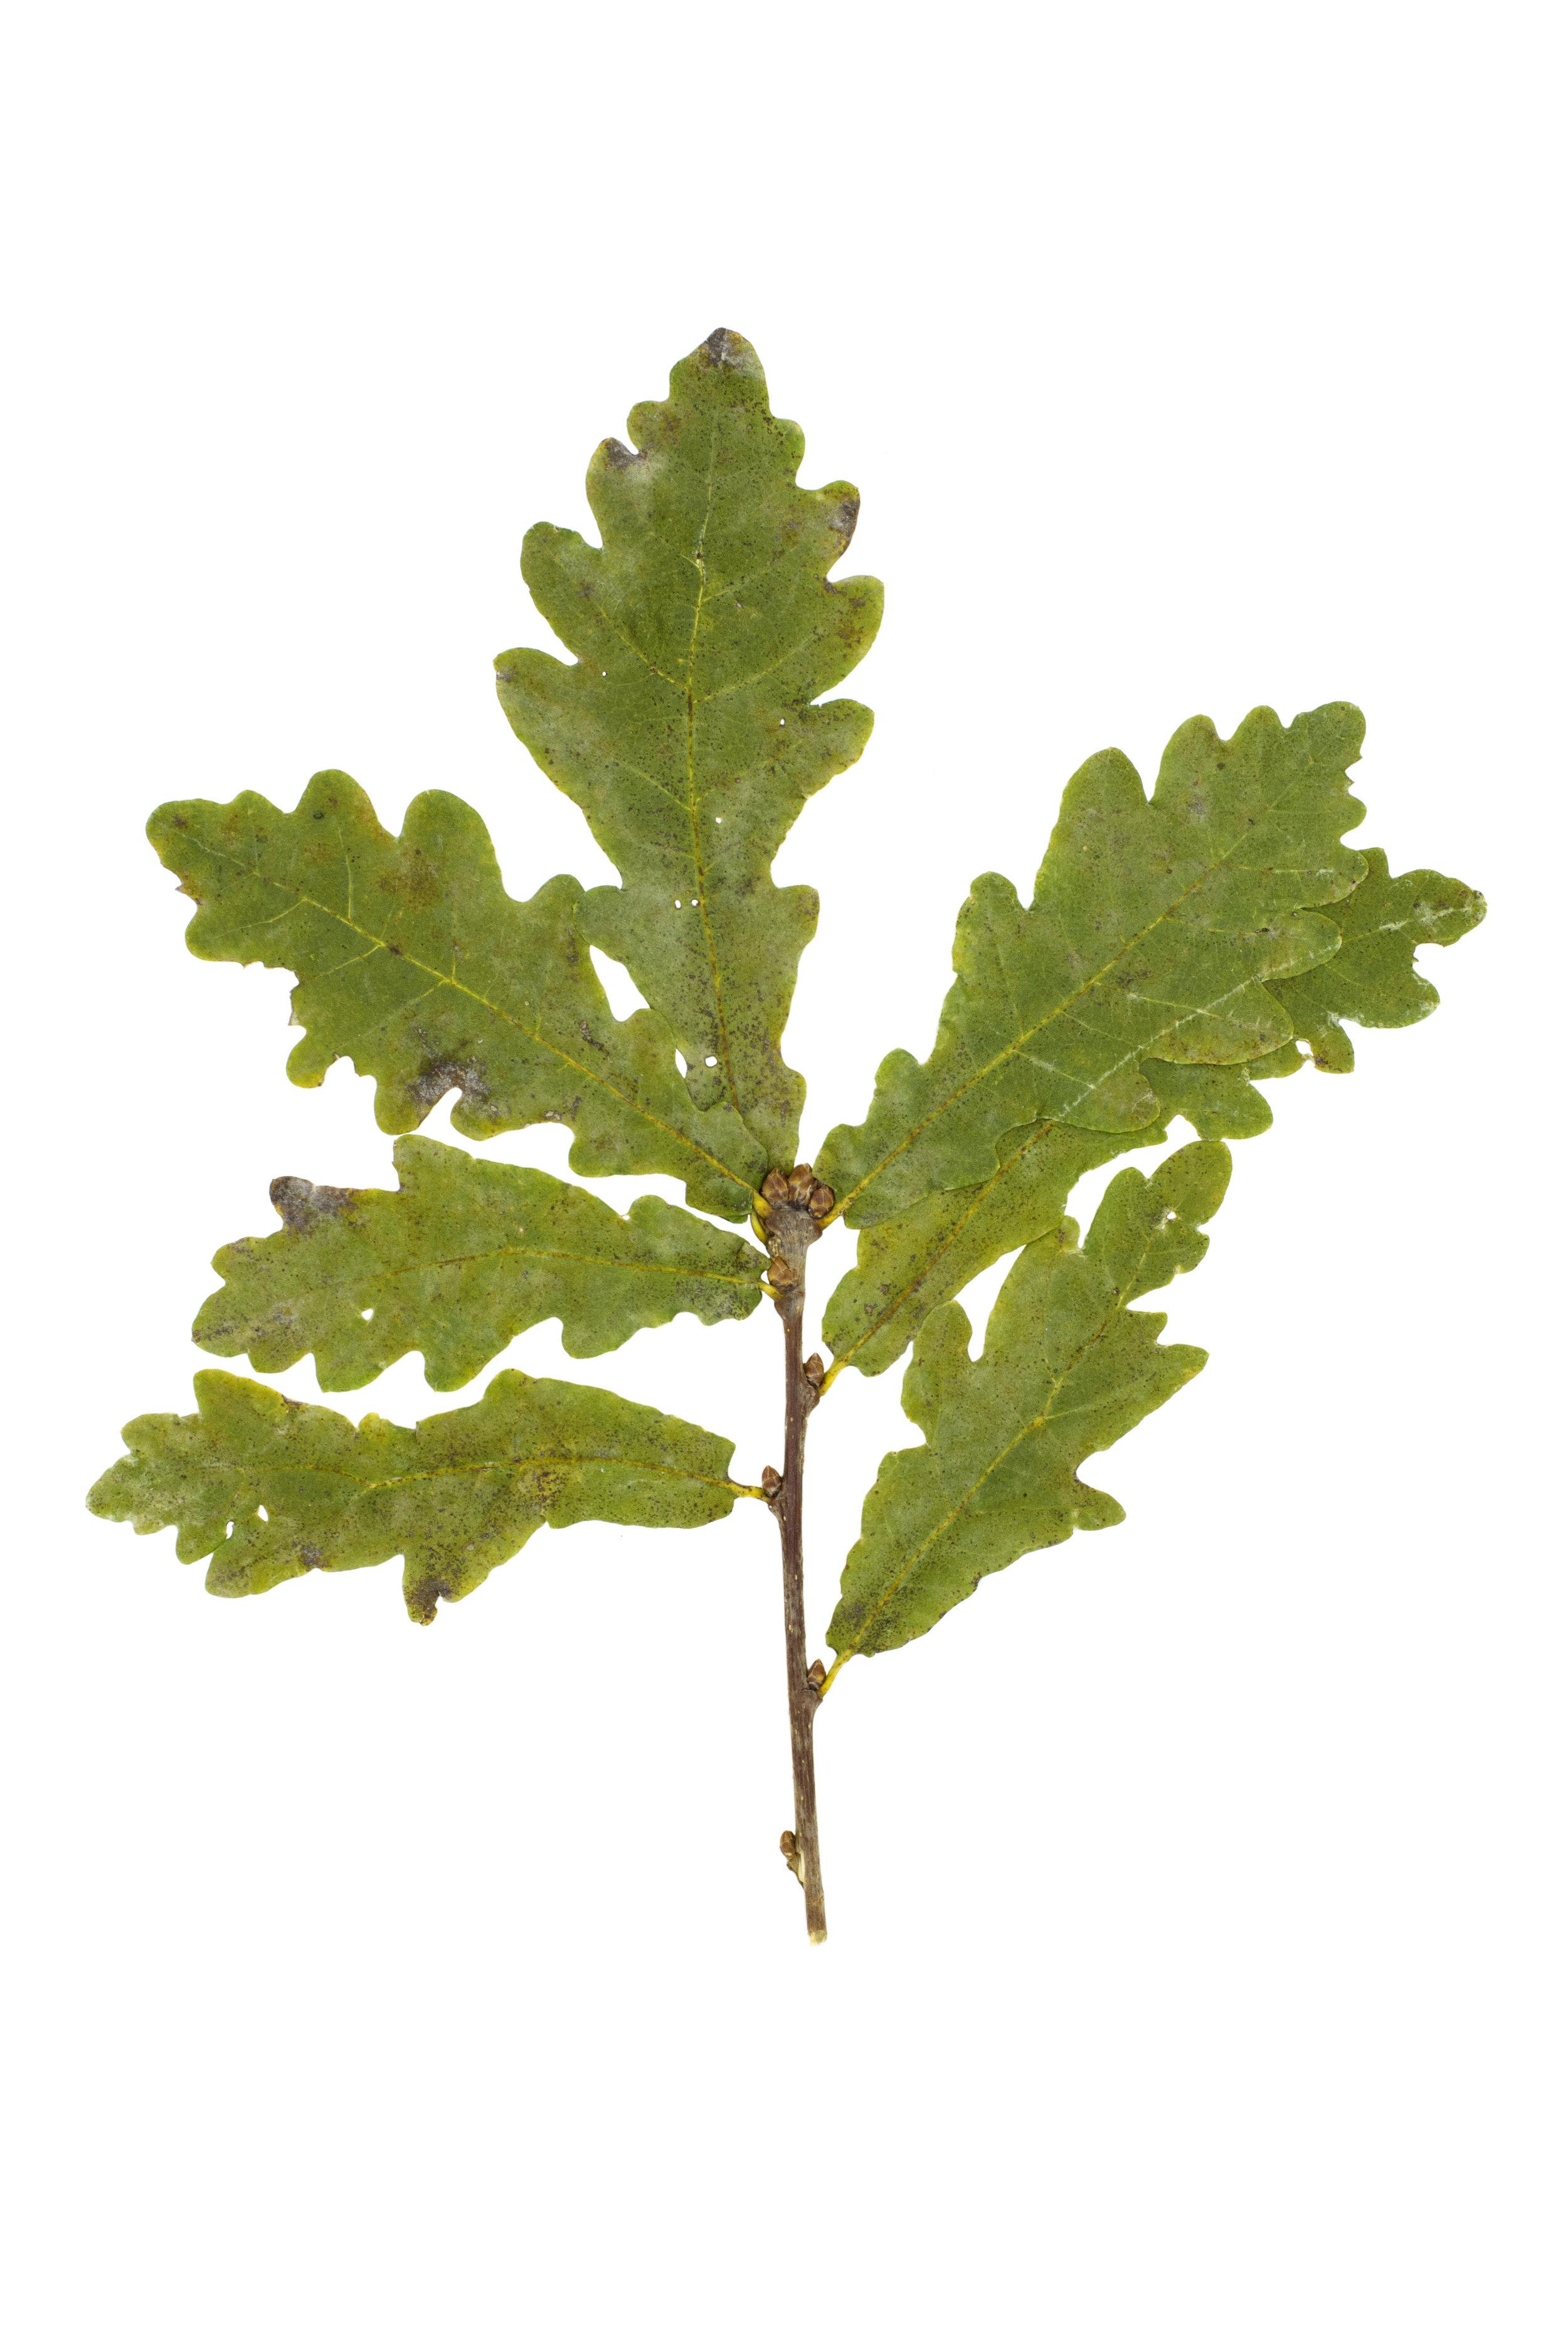 English Oak / Quercus robur